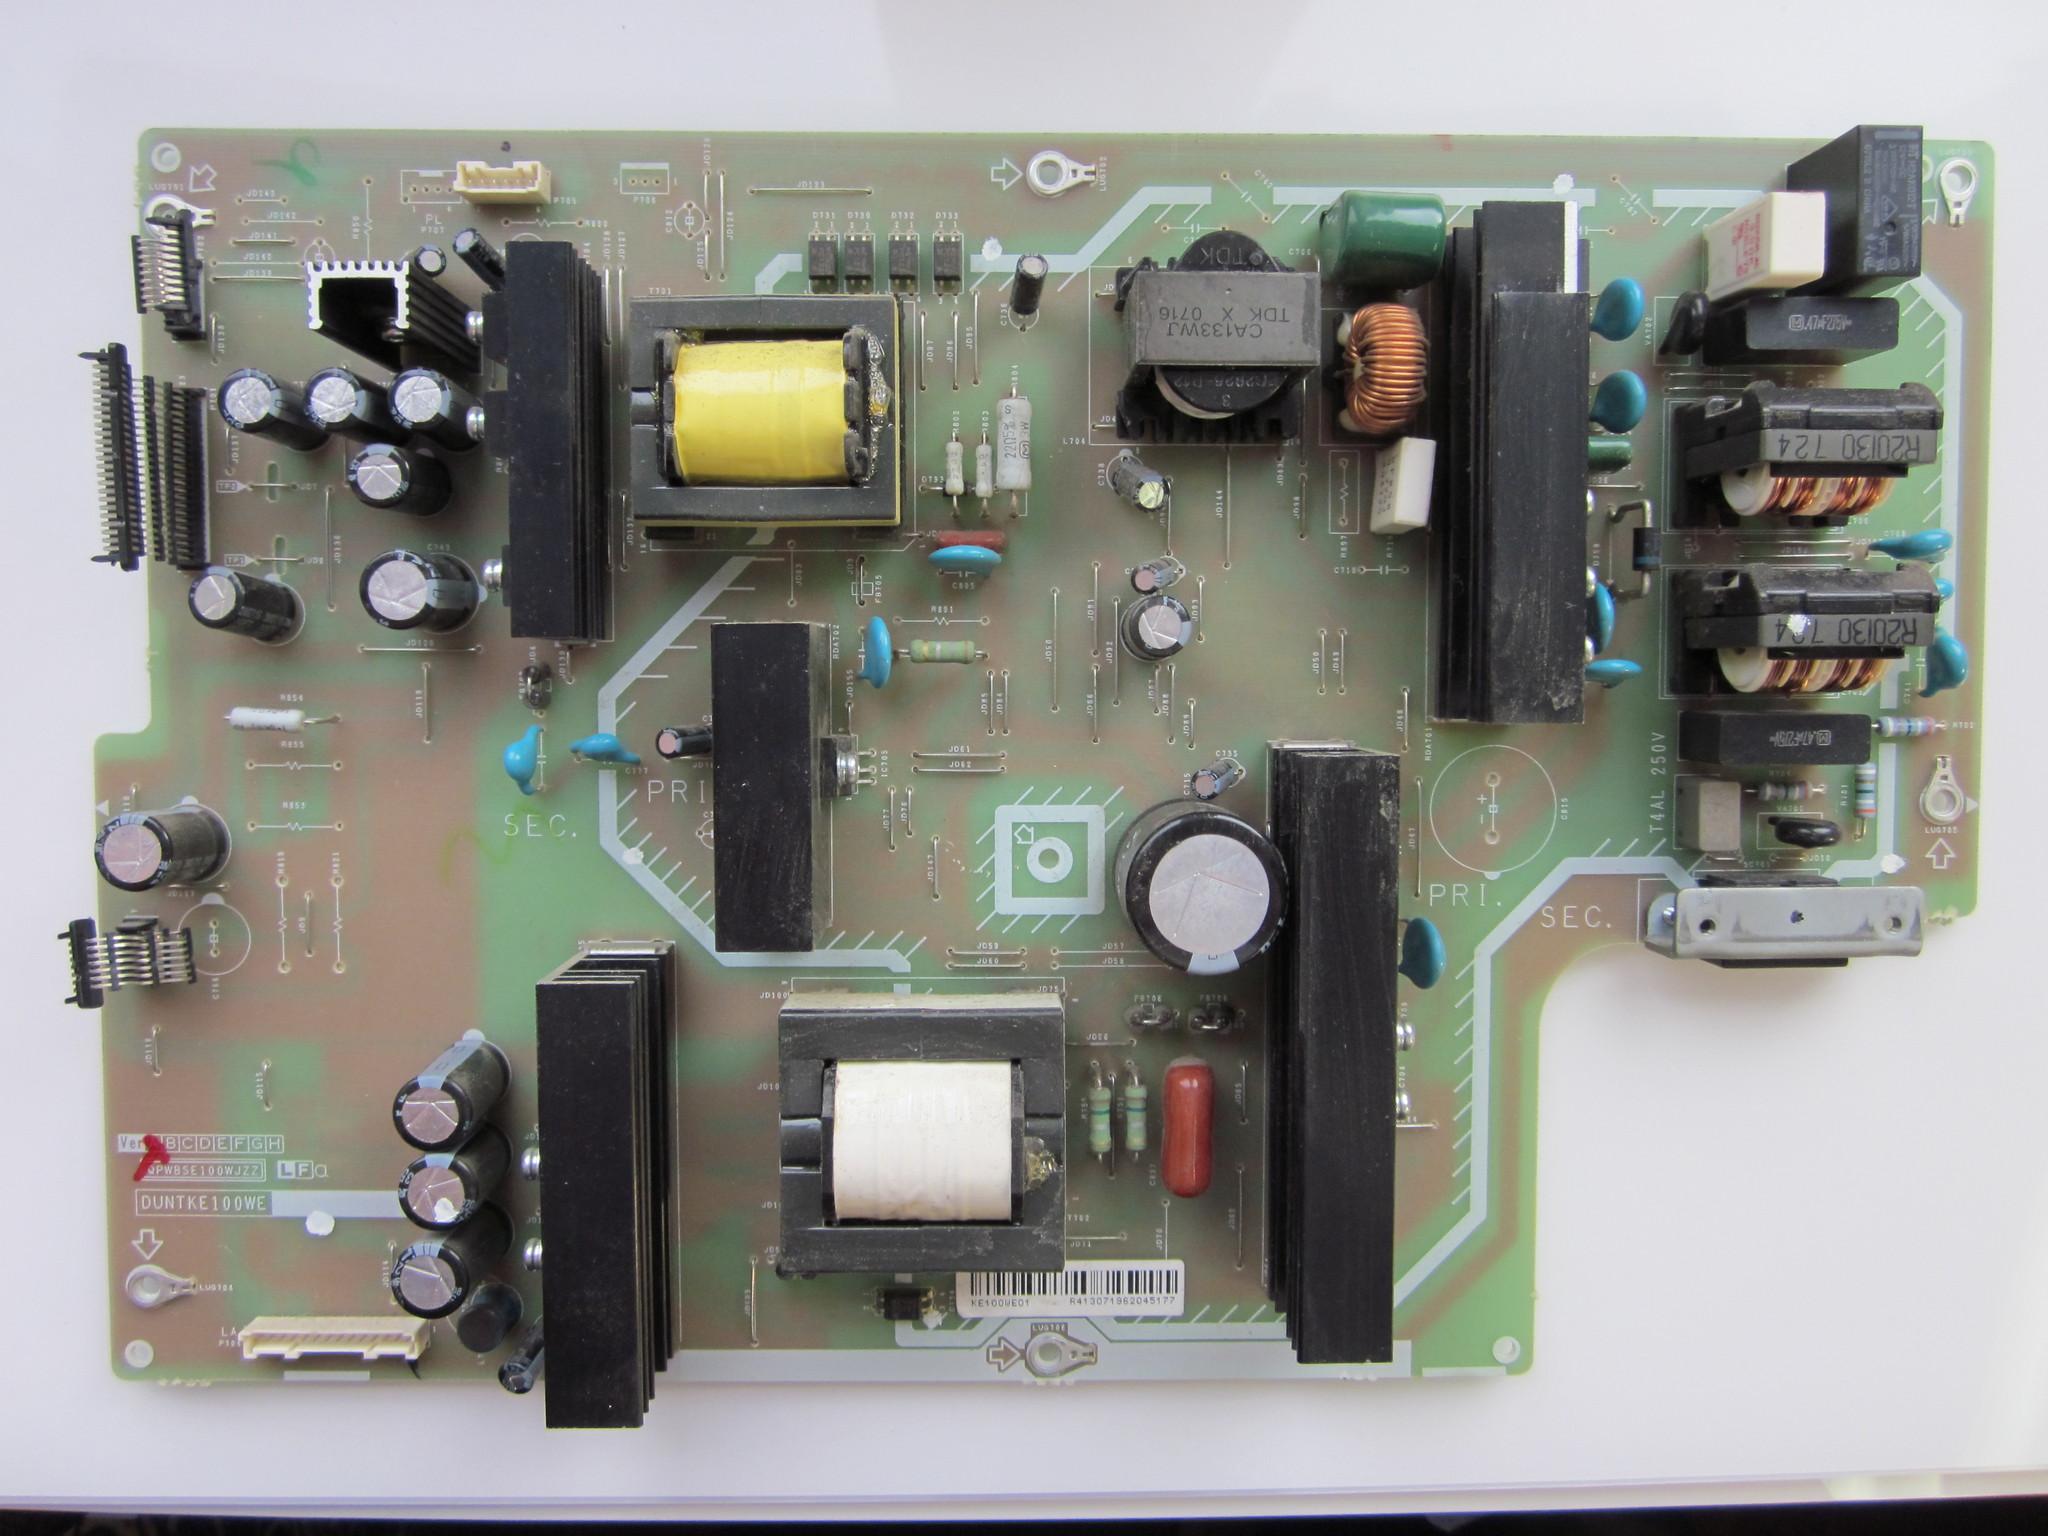 Блок питания SHARP LC-37RD2RU DUNTKE100WE